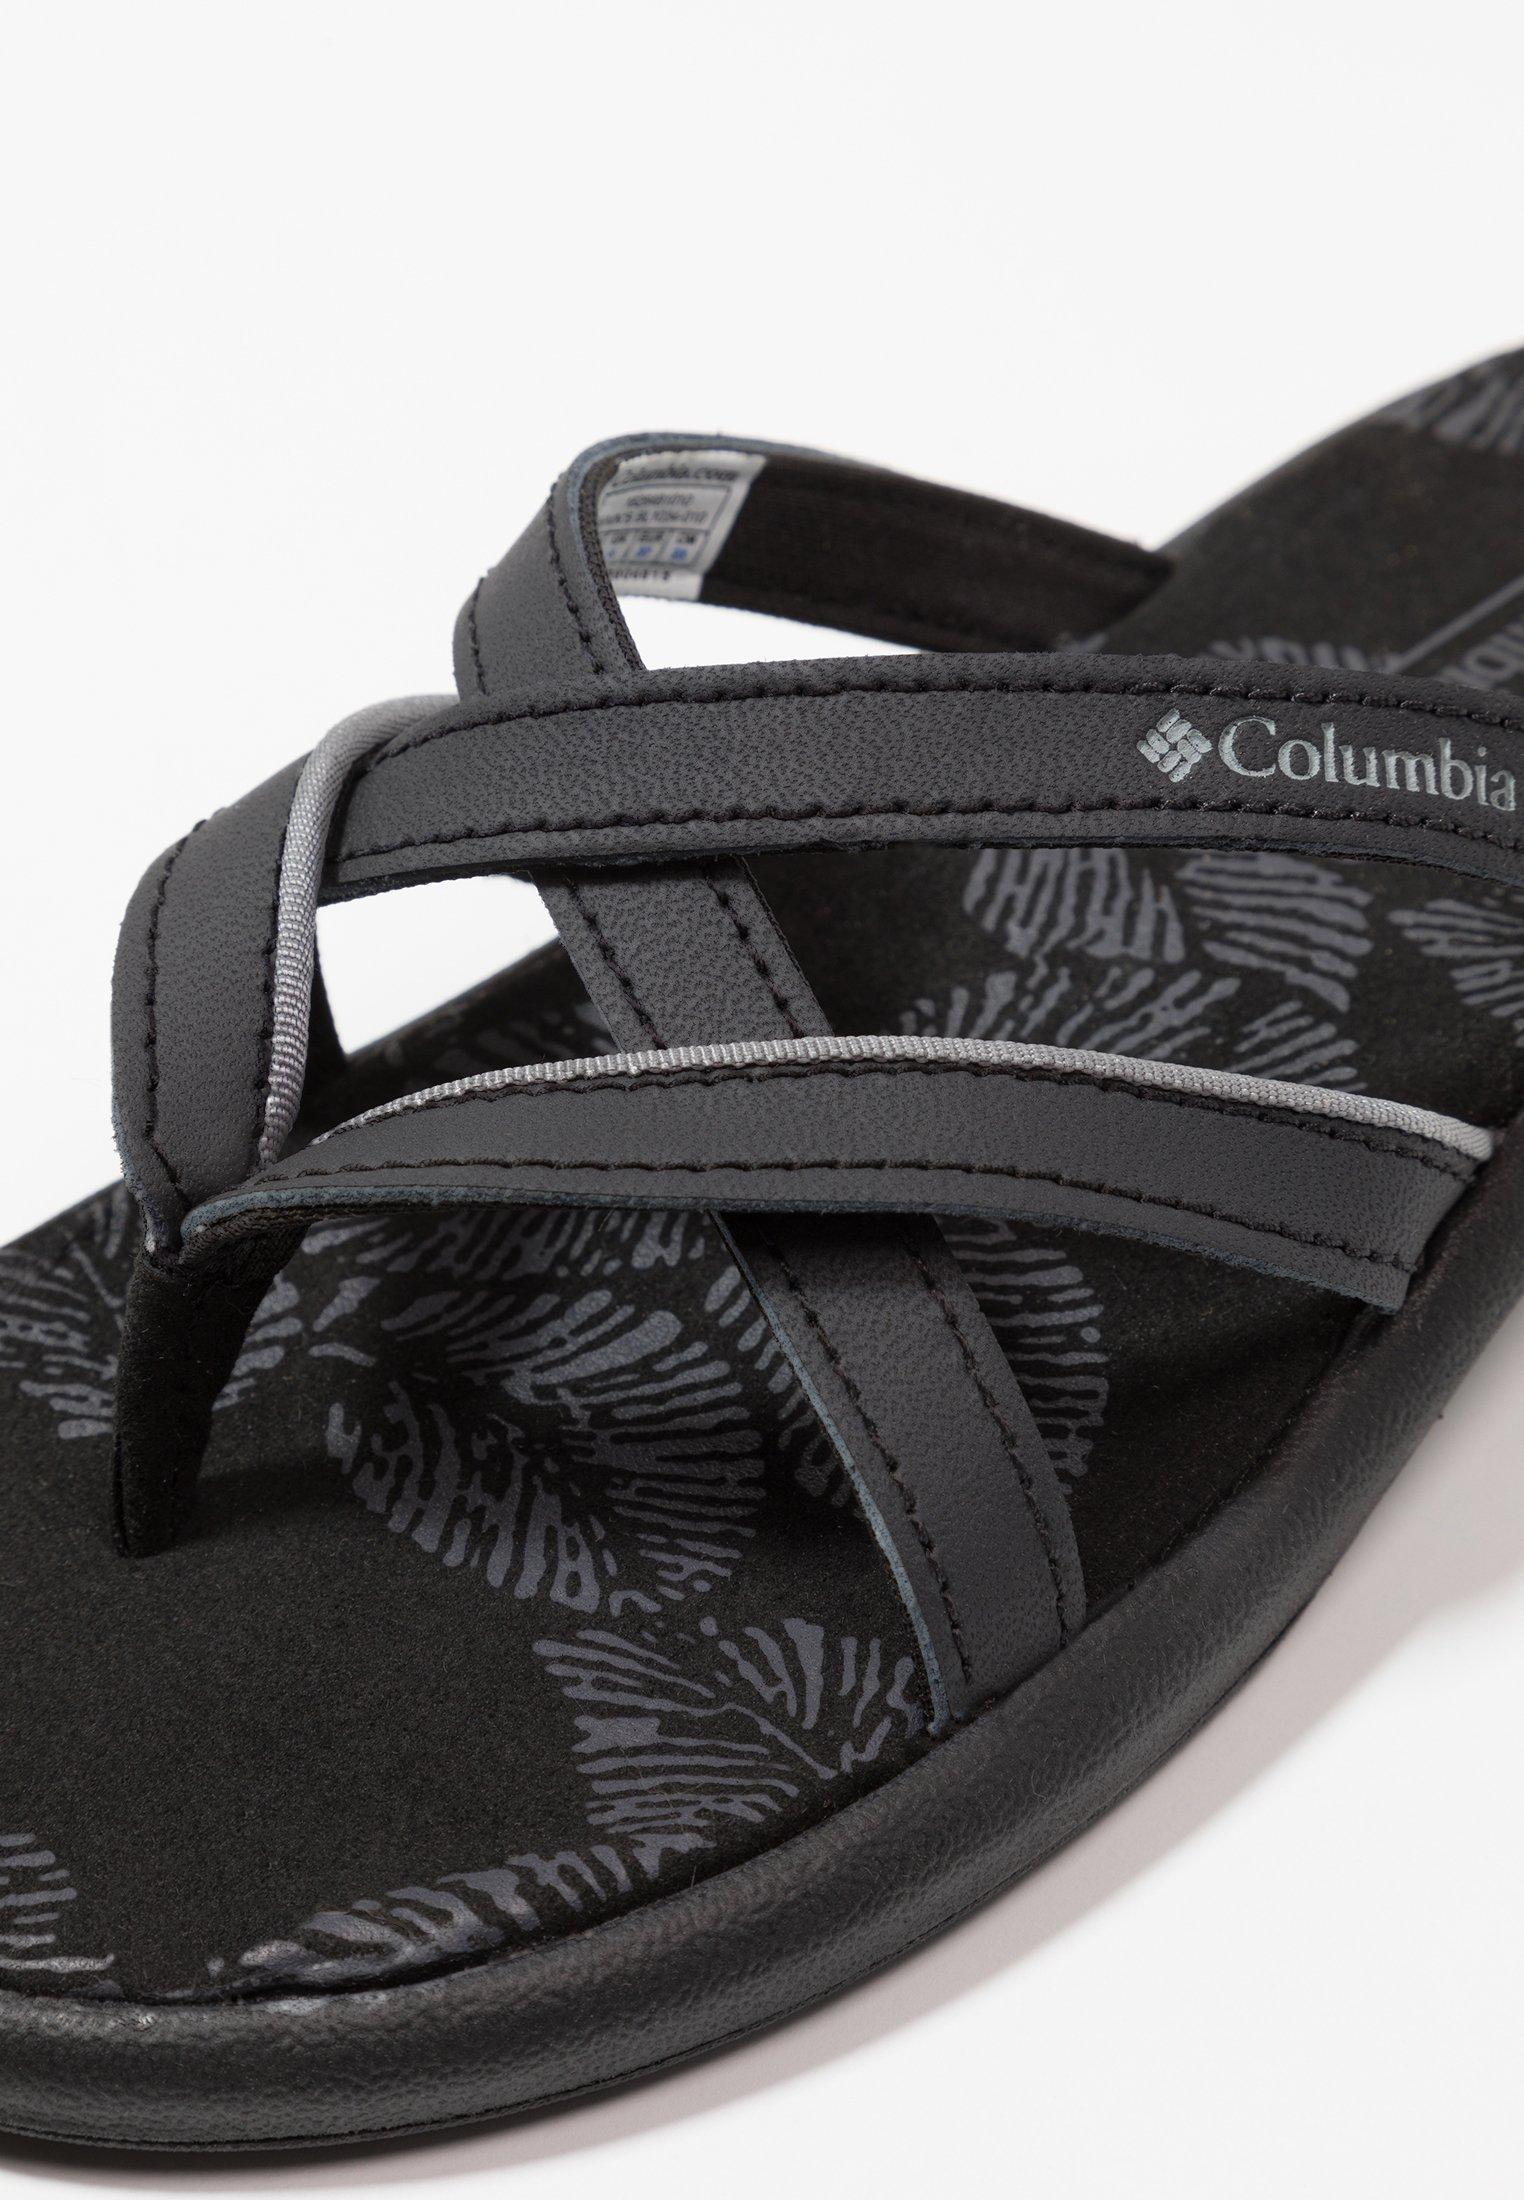 Columbia Kambi Ii - Sandales De Randonnée Black/grey Steel